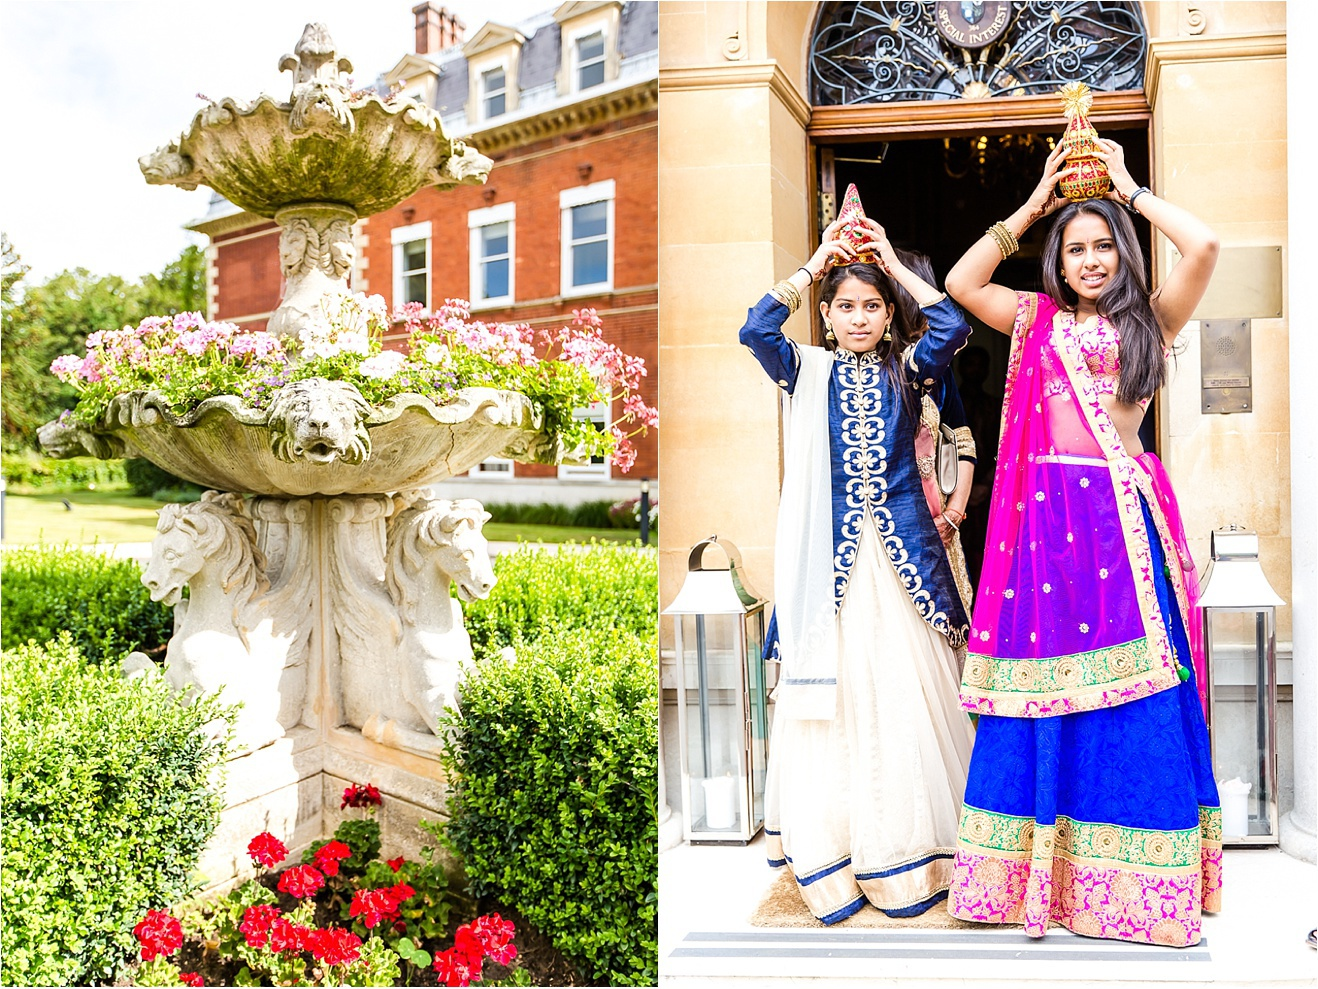 FETCHAM-PARK-SURREY-SWAN-GLOBE-LONDON-WEDDING-PHOTOGRAPHY-EDDIE-JUDD_0003